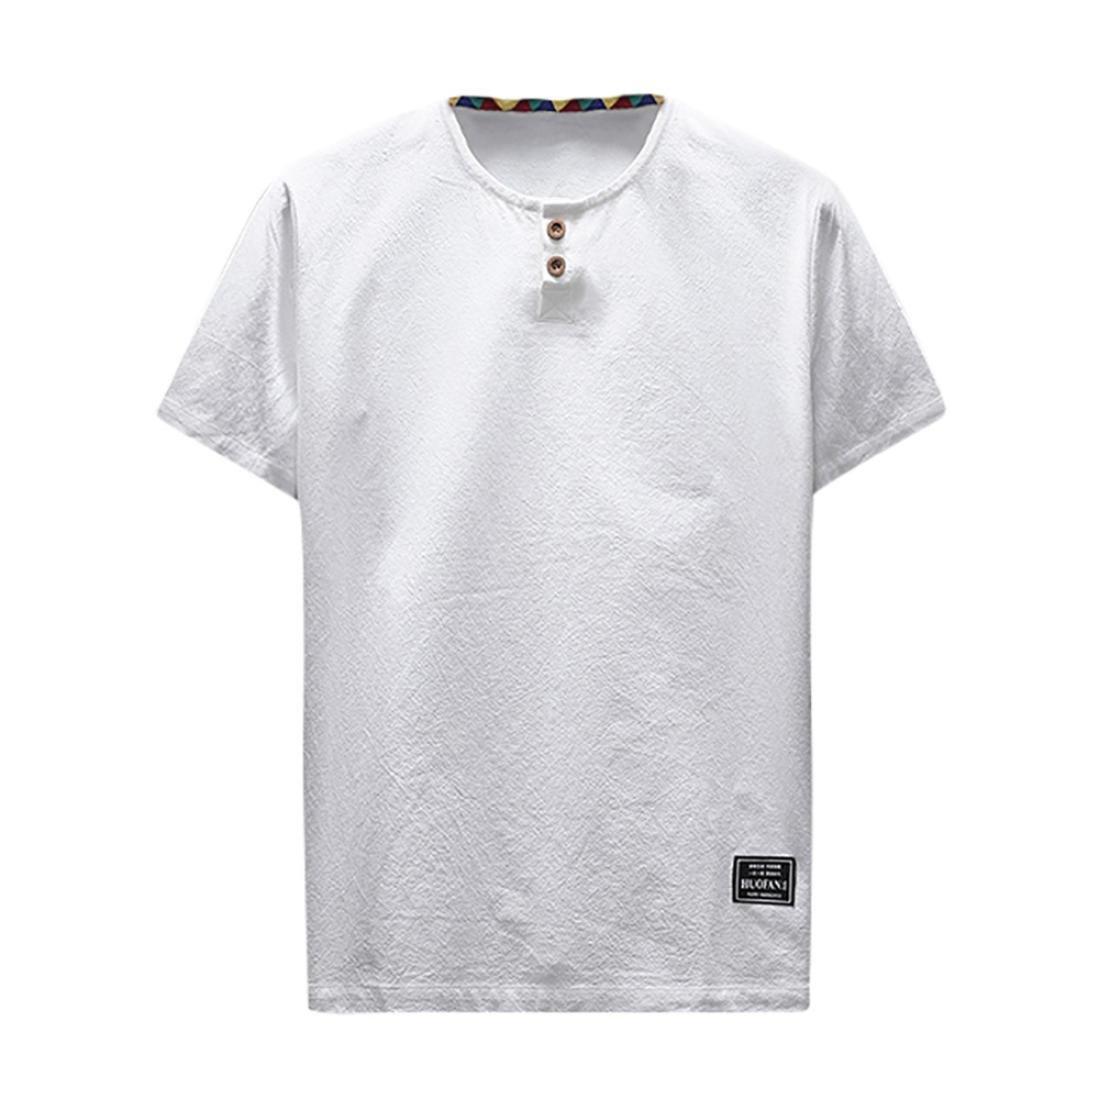 29c888205f74b7 TEELONG Herren Sommer Lässige Bettwäsche und Baumwolle Kurzarm V-Ausschnitt  T-Shirt Top Bluse Tee Hemd Weste Sweatshirt Baumwollshirt Longshirt ...